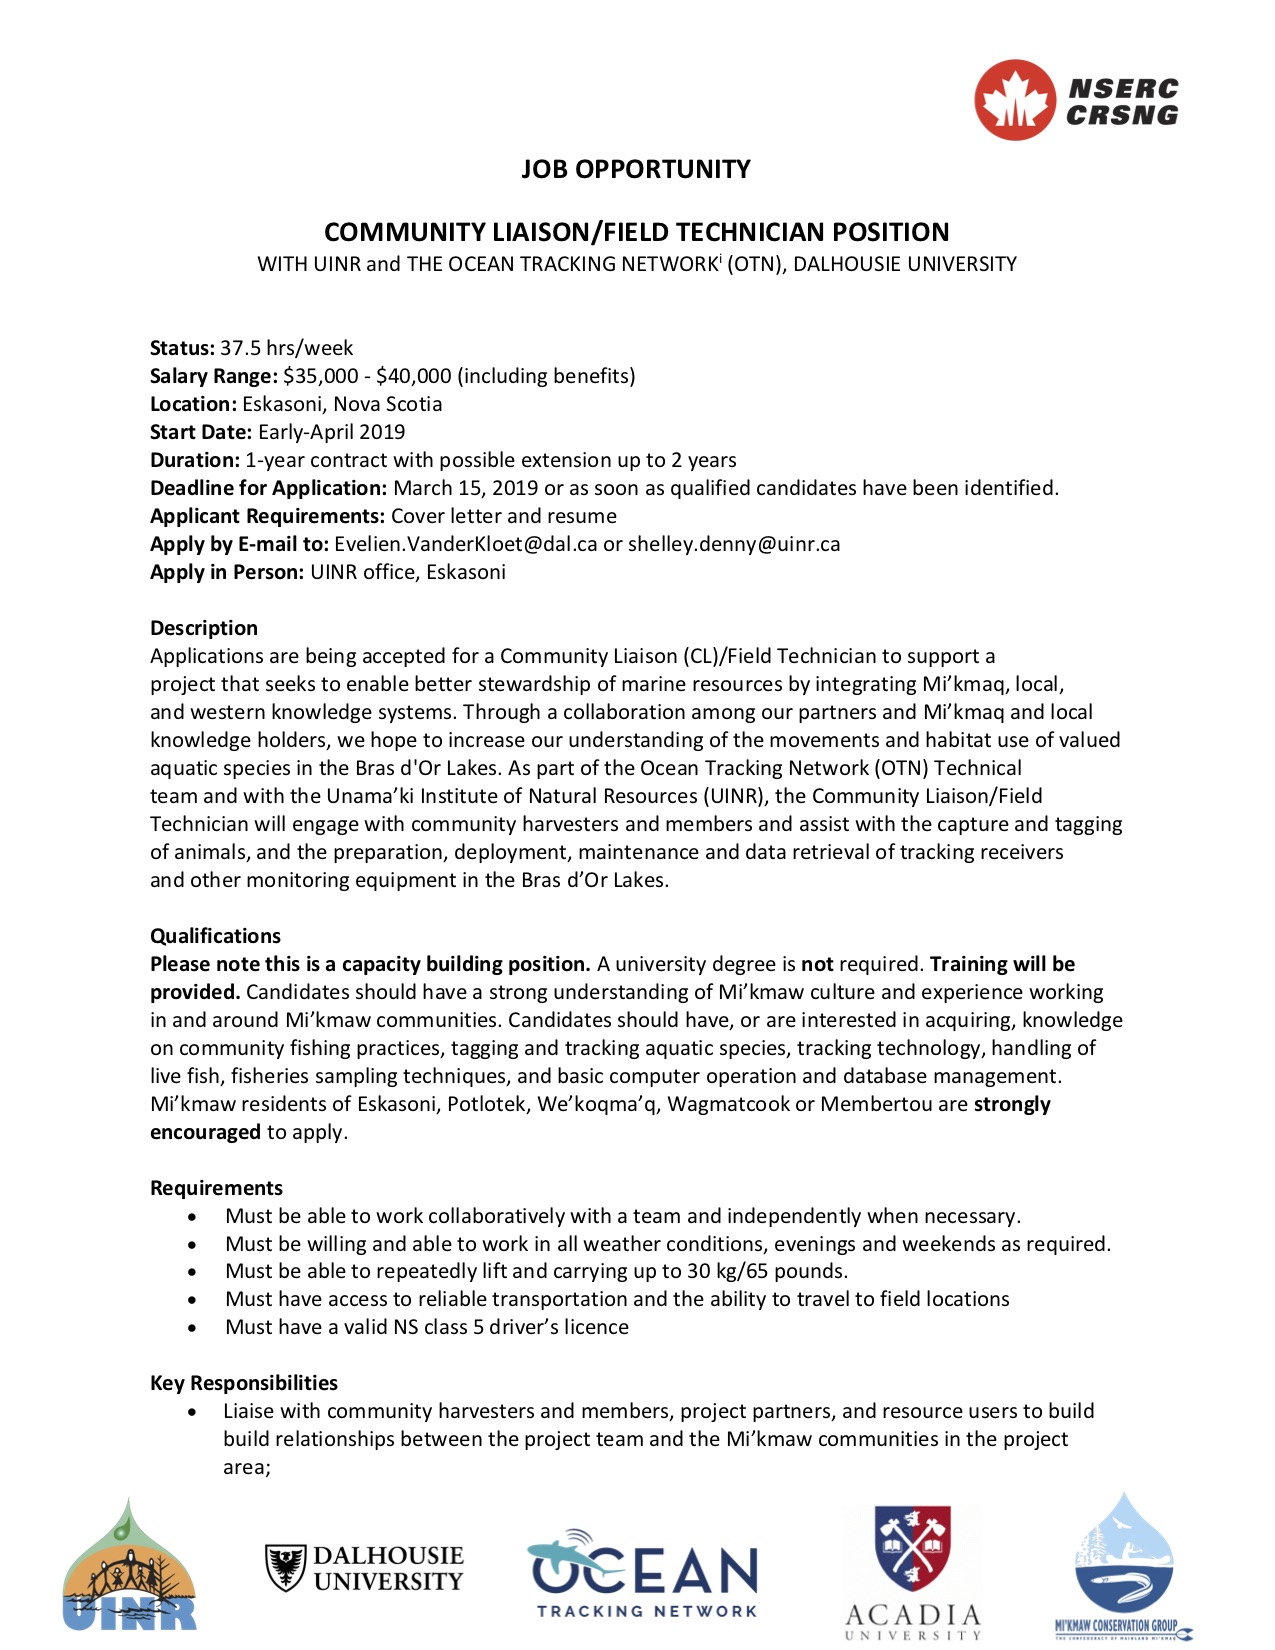 Job Opportunity: Community Liaison / Field Technician